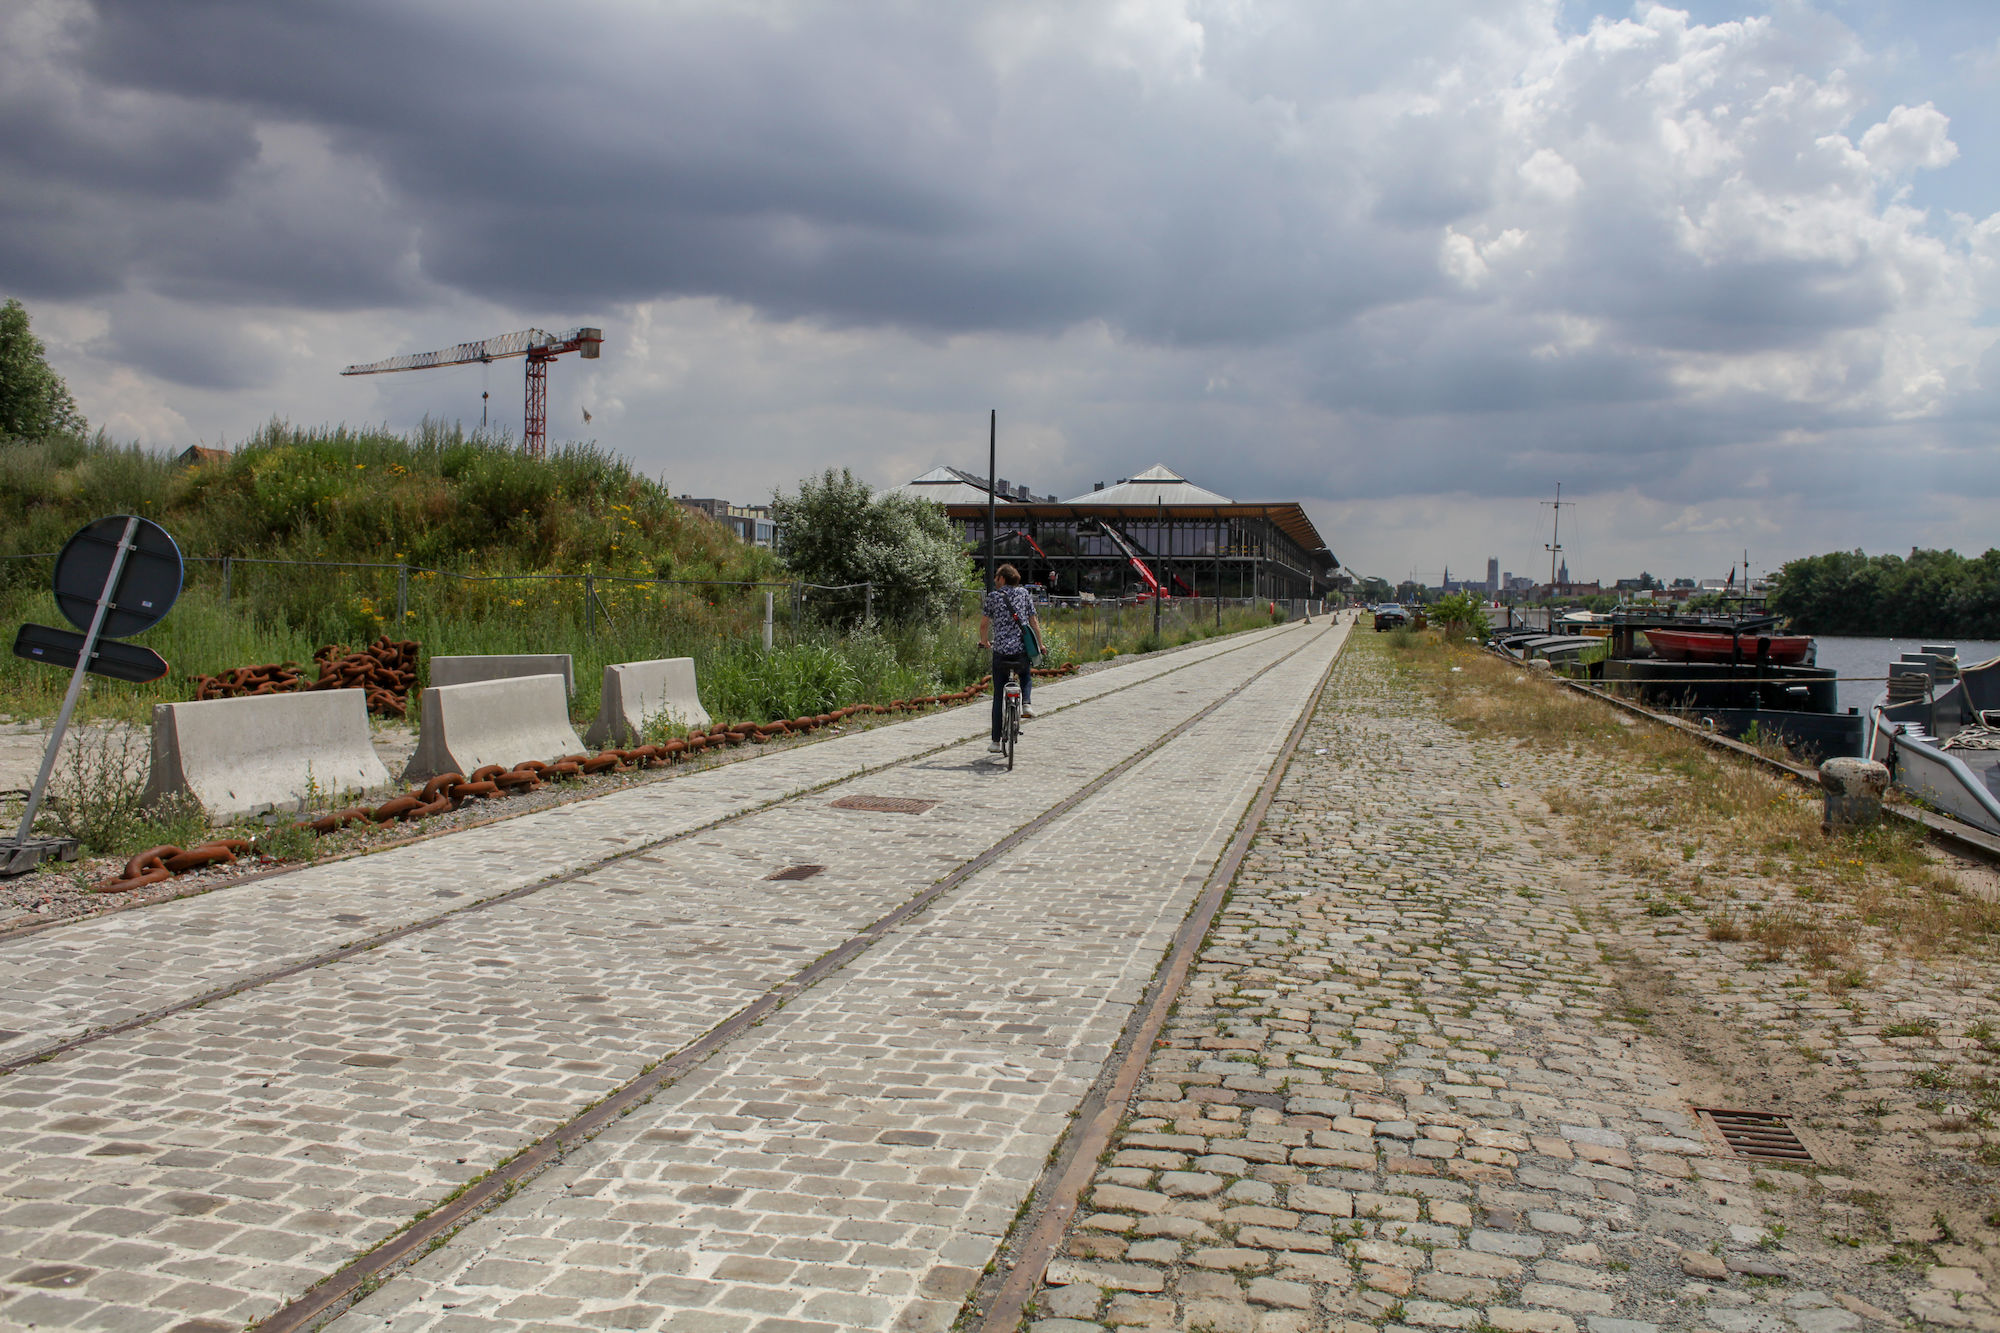 2019-07-02 Muide Meulestede prospectie Wannes_stadsvernieuwing_IMG_0409-2.jpg